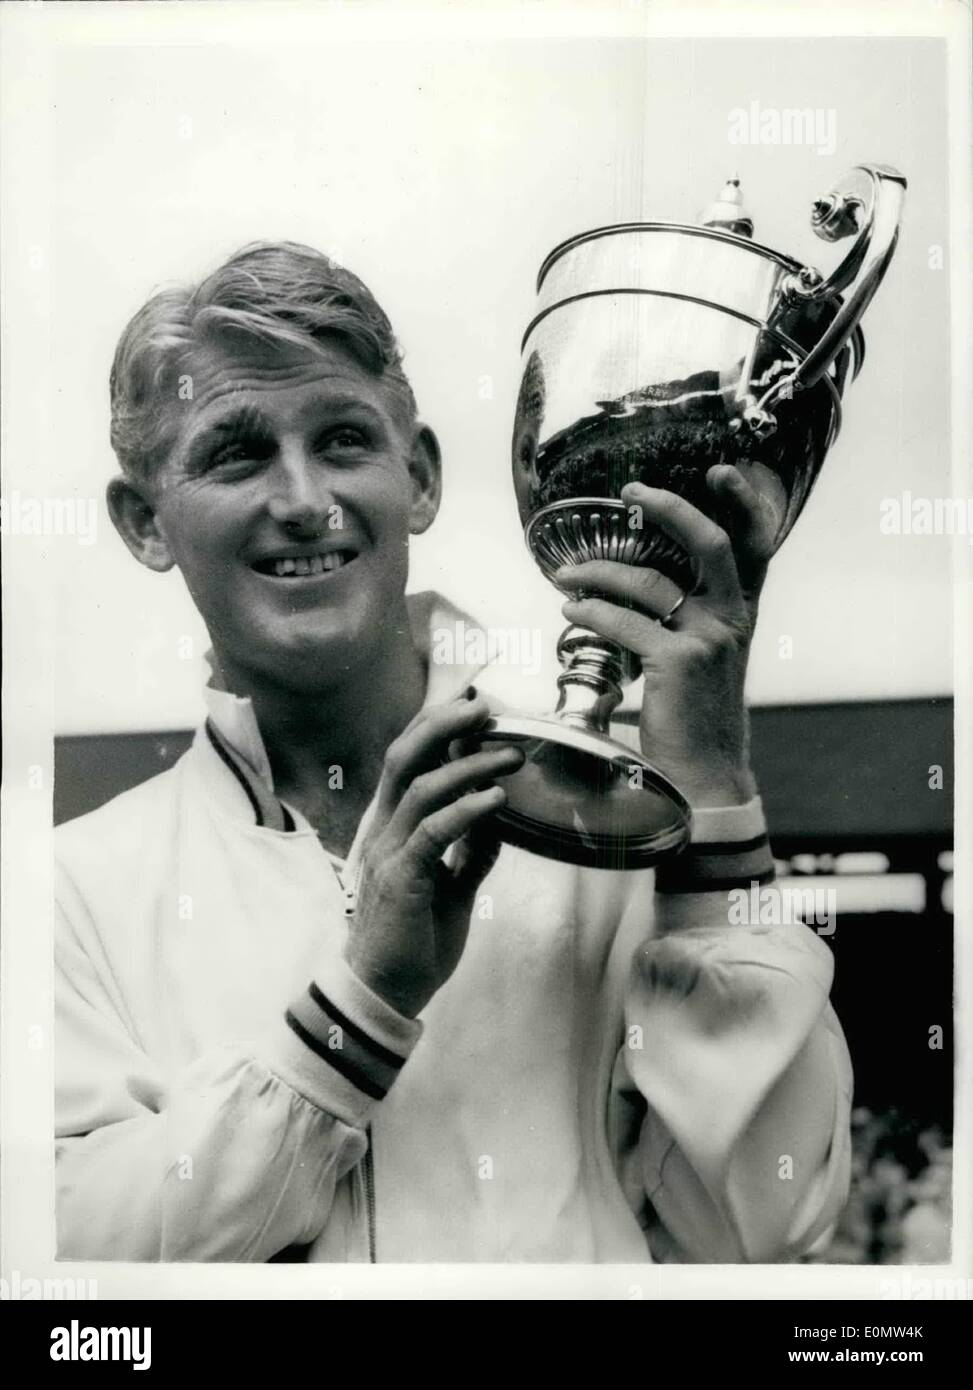 Jul 07 1956 Lew Hoad wins men s singles championship Holds up